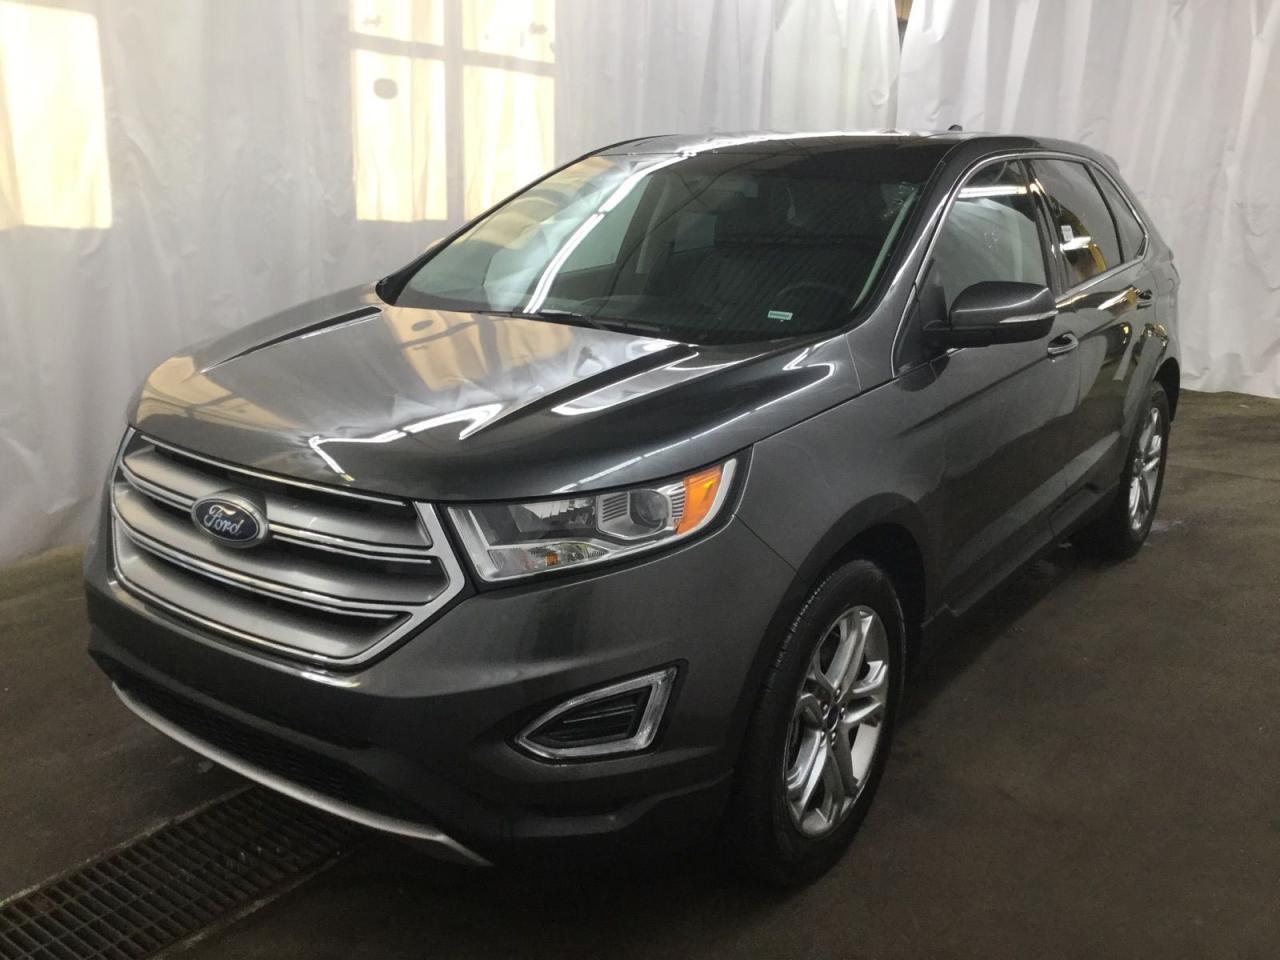 2016 Ford Edge Titanium AWD, Lthr, Moonroof, Nav